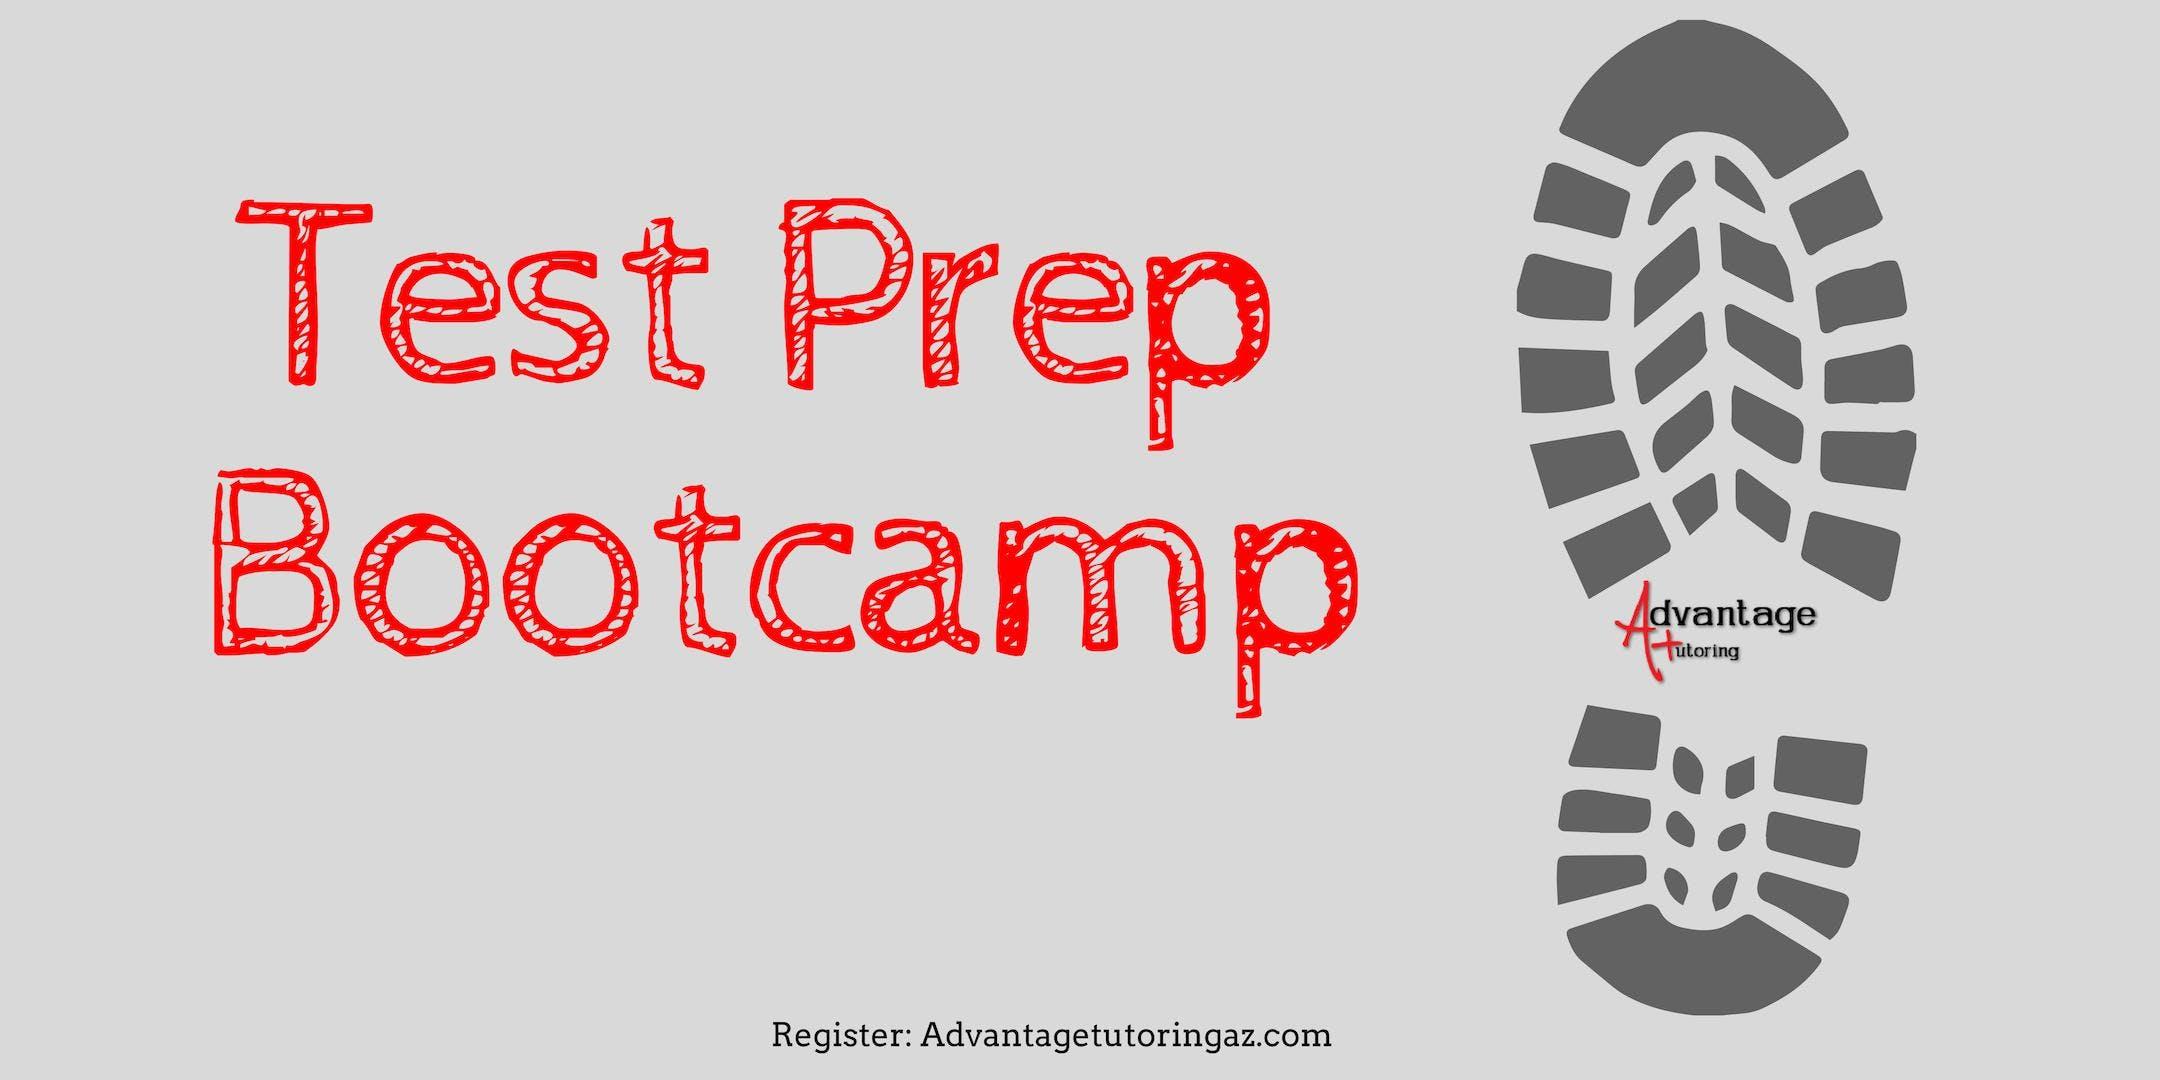 Advantage Tutoring Test Prep Bootcamp